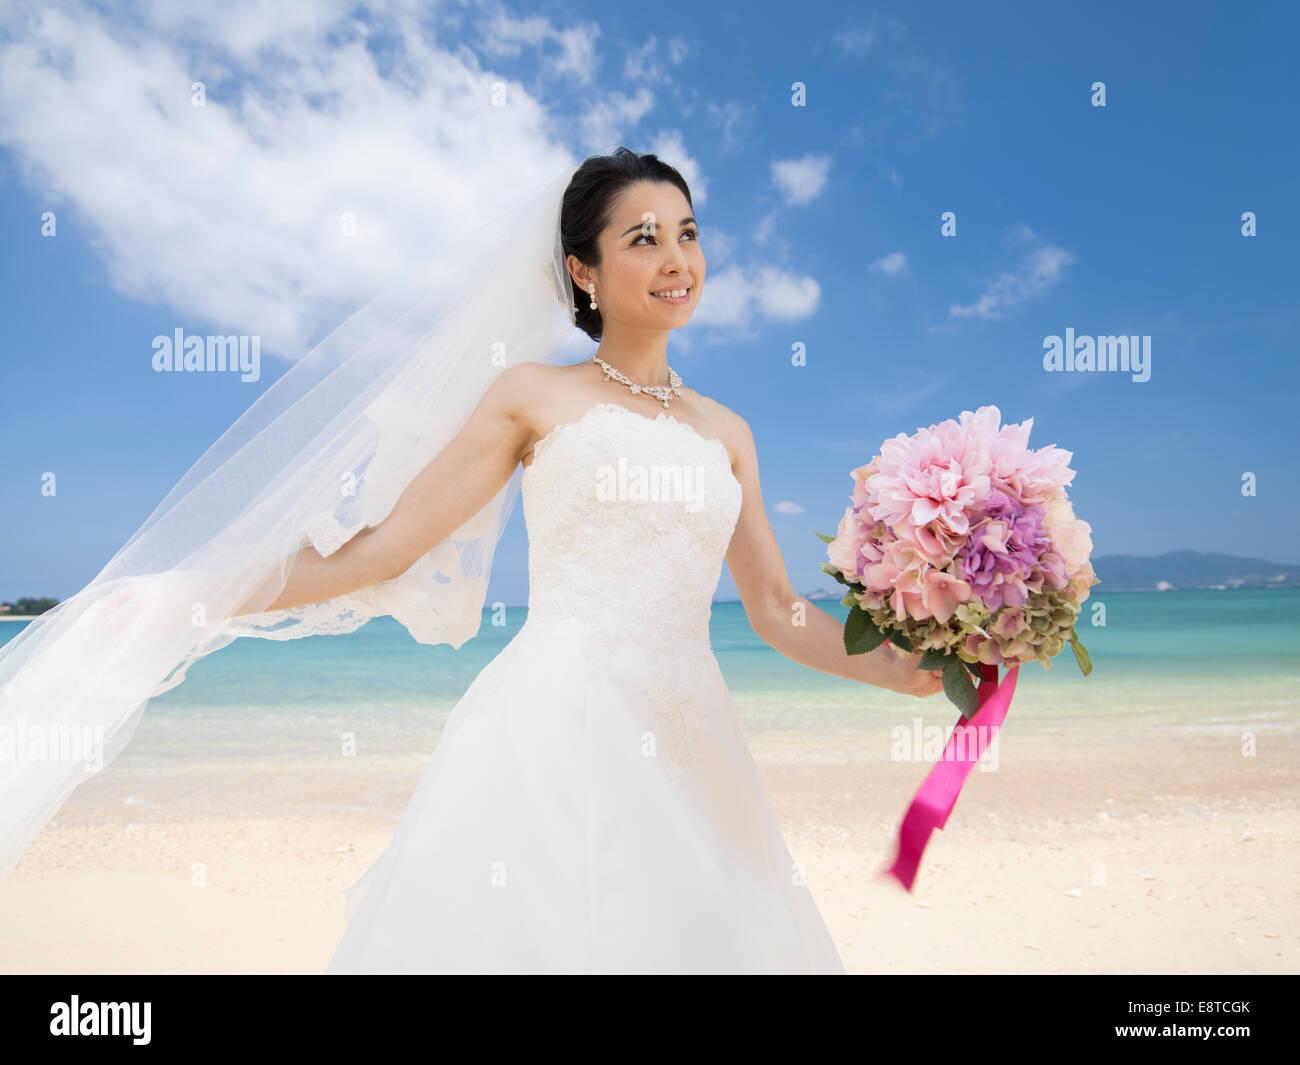 Mixed Race Asian American Bride In White Wedding Dress At Destination Beach Okinawa Japan